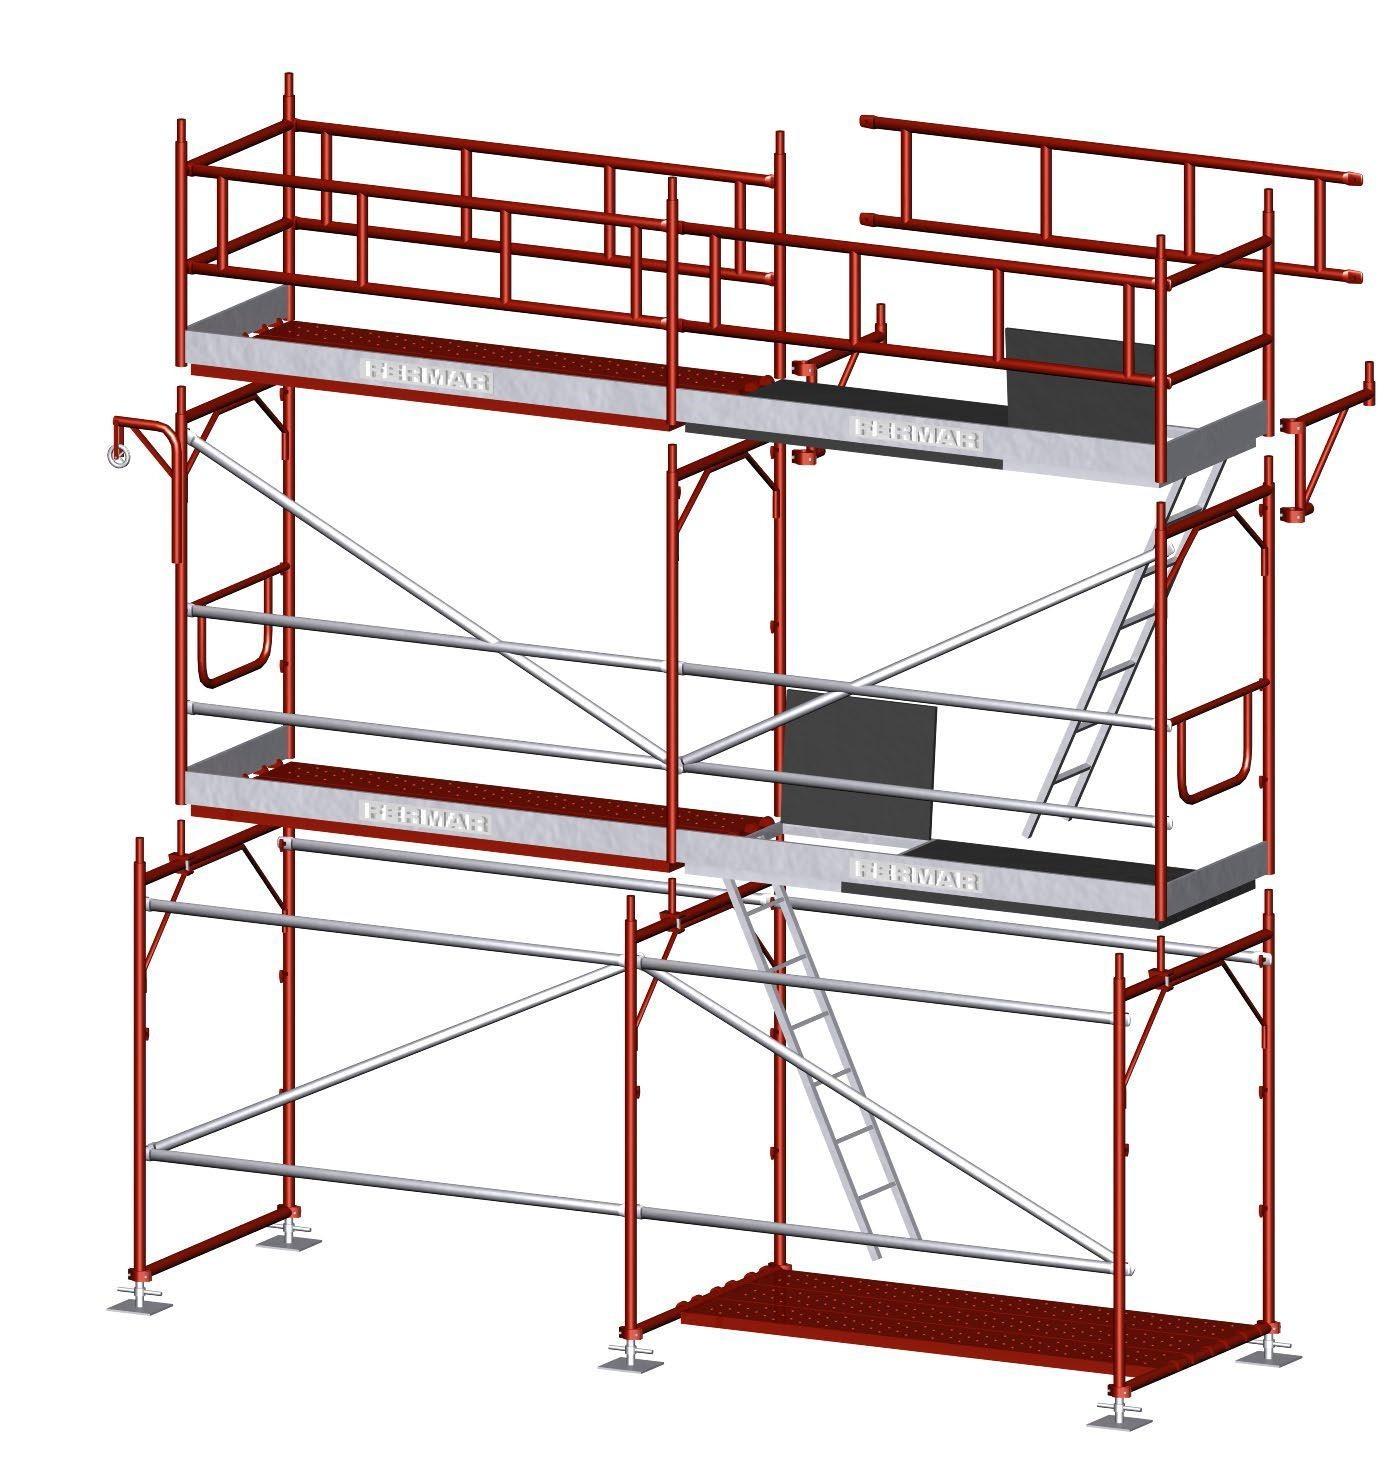 PACK ANDAMIO EUROPEO 9x7 mts (63 m2) - Belians Gestio s.l.